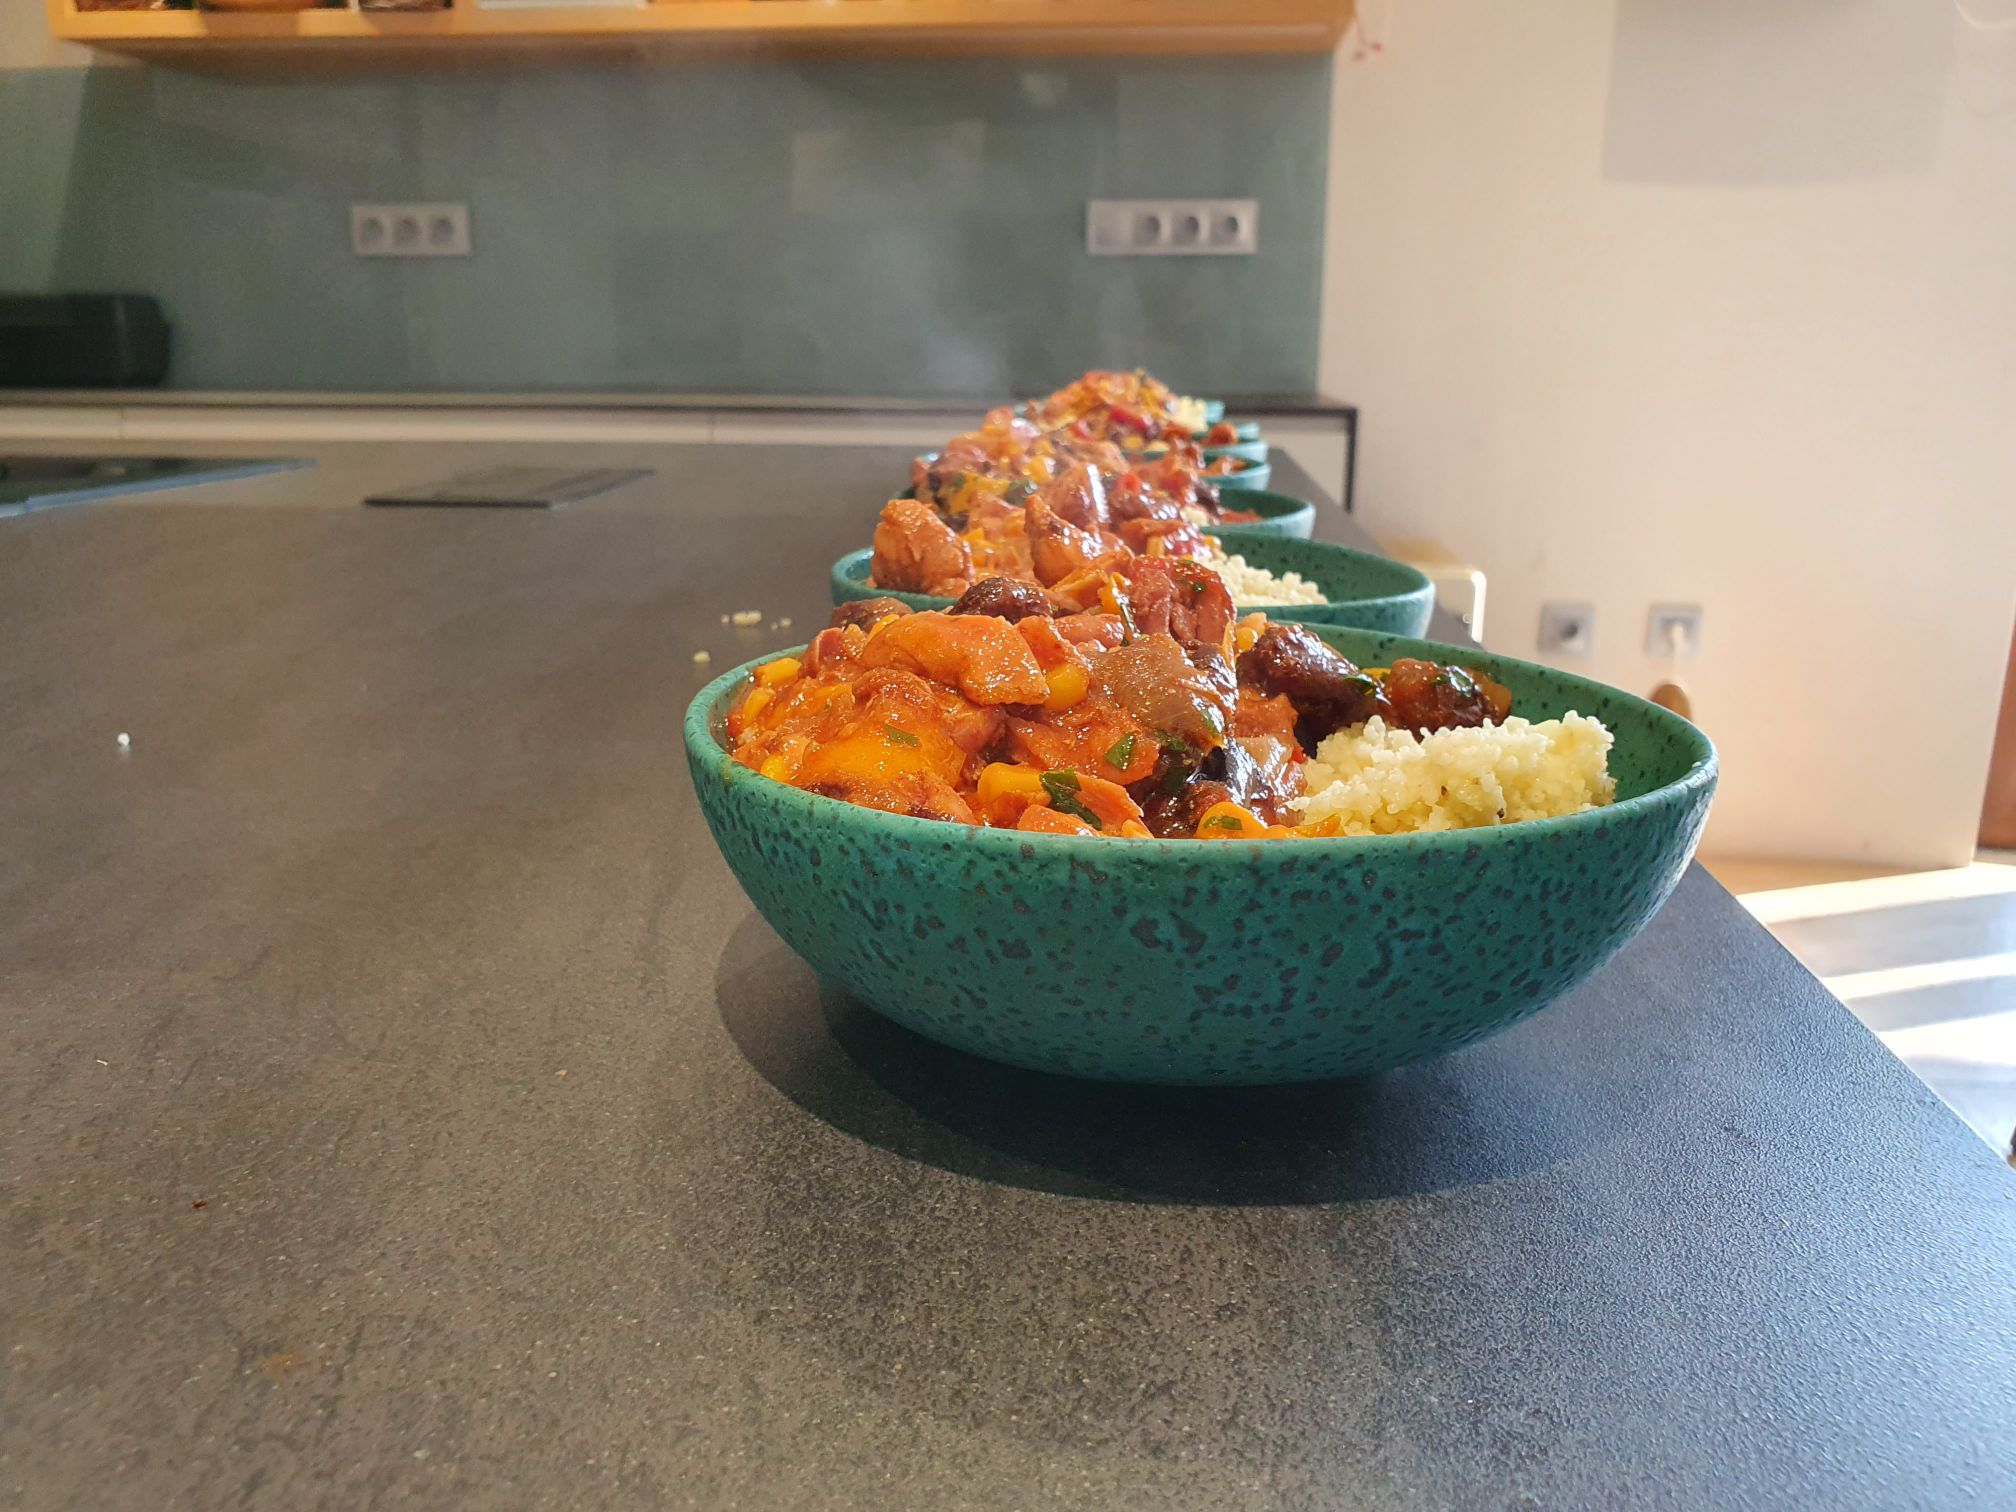 Csirke Tagine Kamado Chef grillben